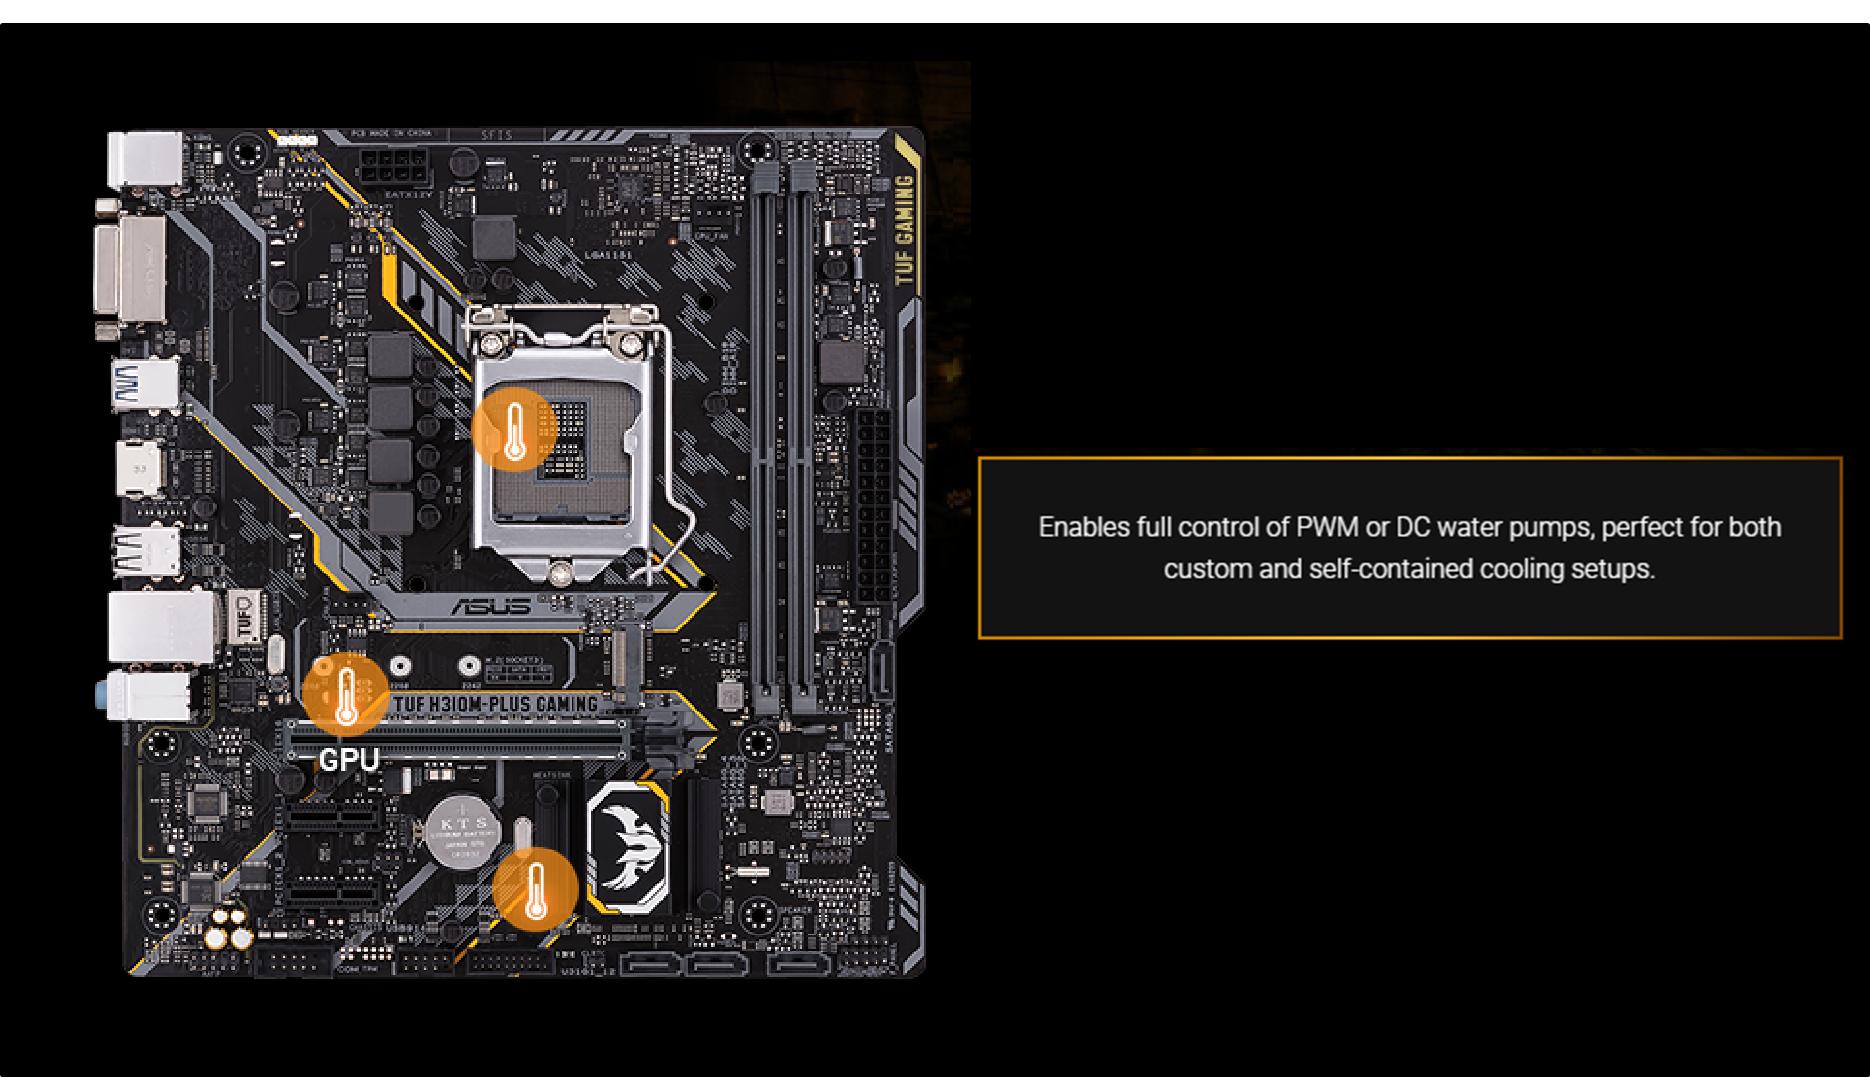 Asus Tuf H310 Plus Gaming Lga1151 Intel Ddr4 Sata3usb31 M Electric Circuit Board Processor Tshirts View Larger